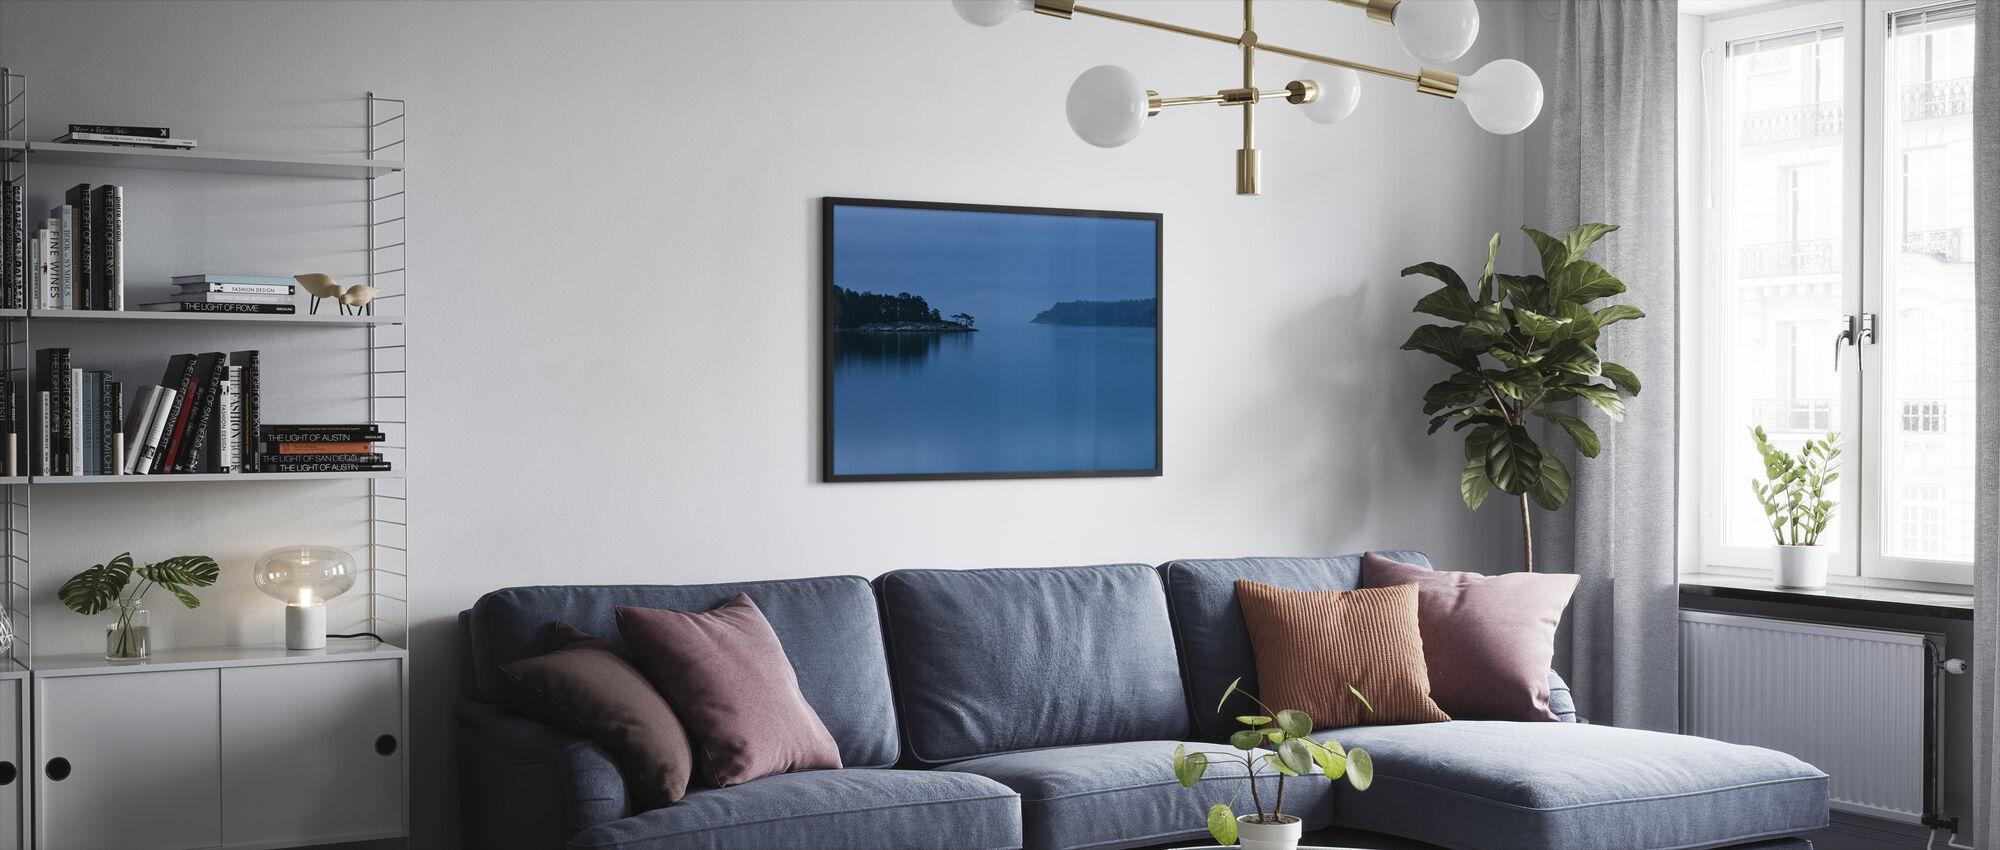 Dusk in Stockholm Archipelago - Framed print - Living Room